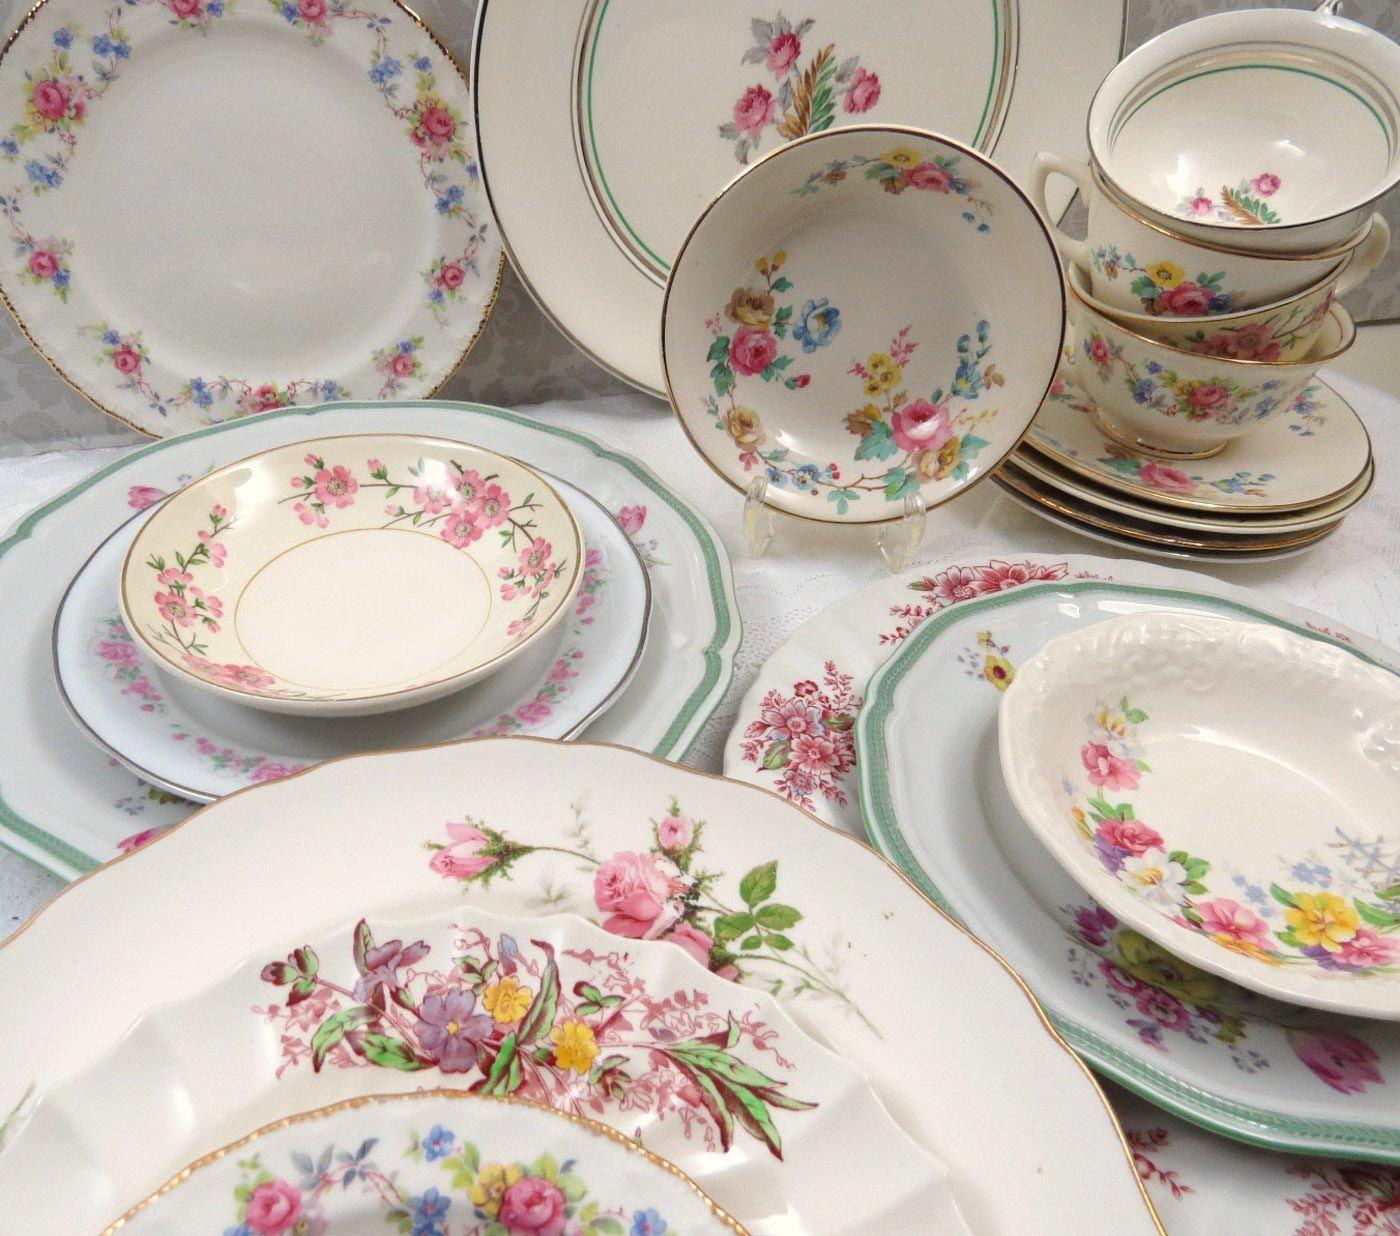 20 Pc Mismatched Dinnerware Set Service For 4 In Vintage Fine